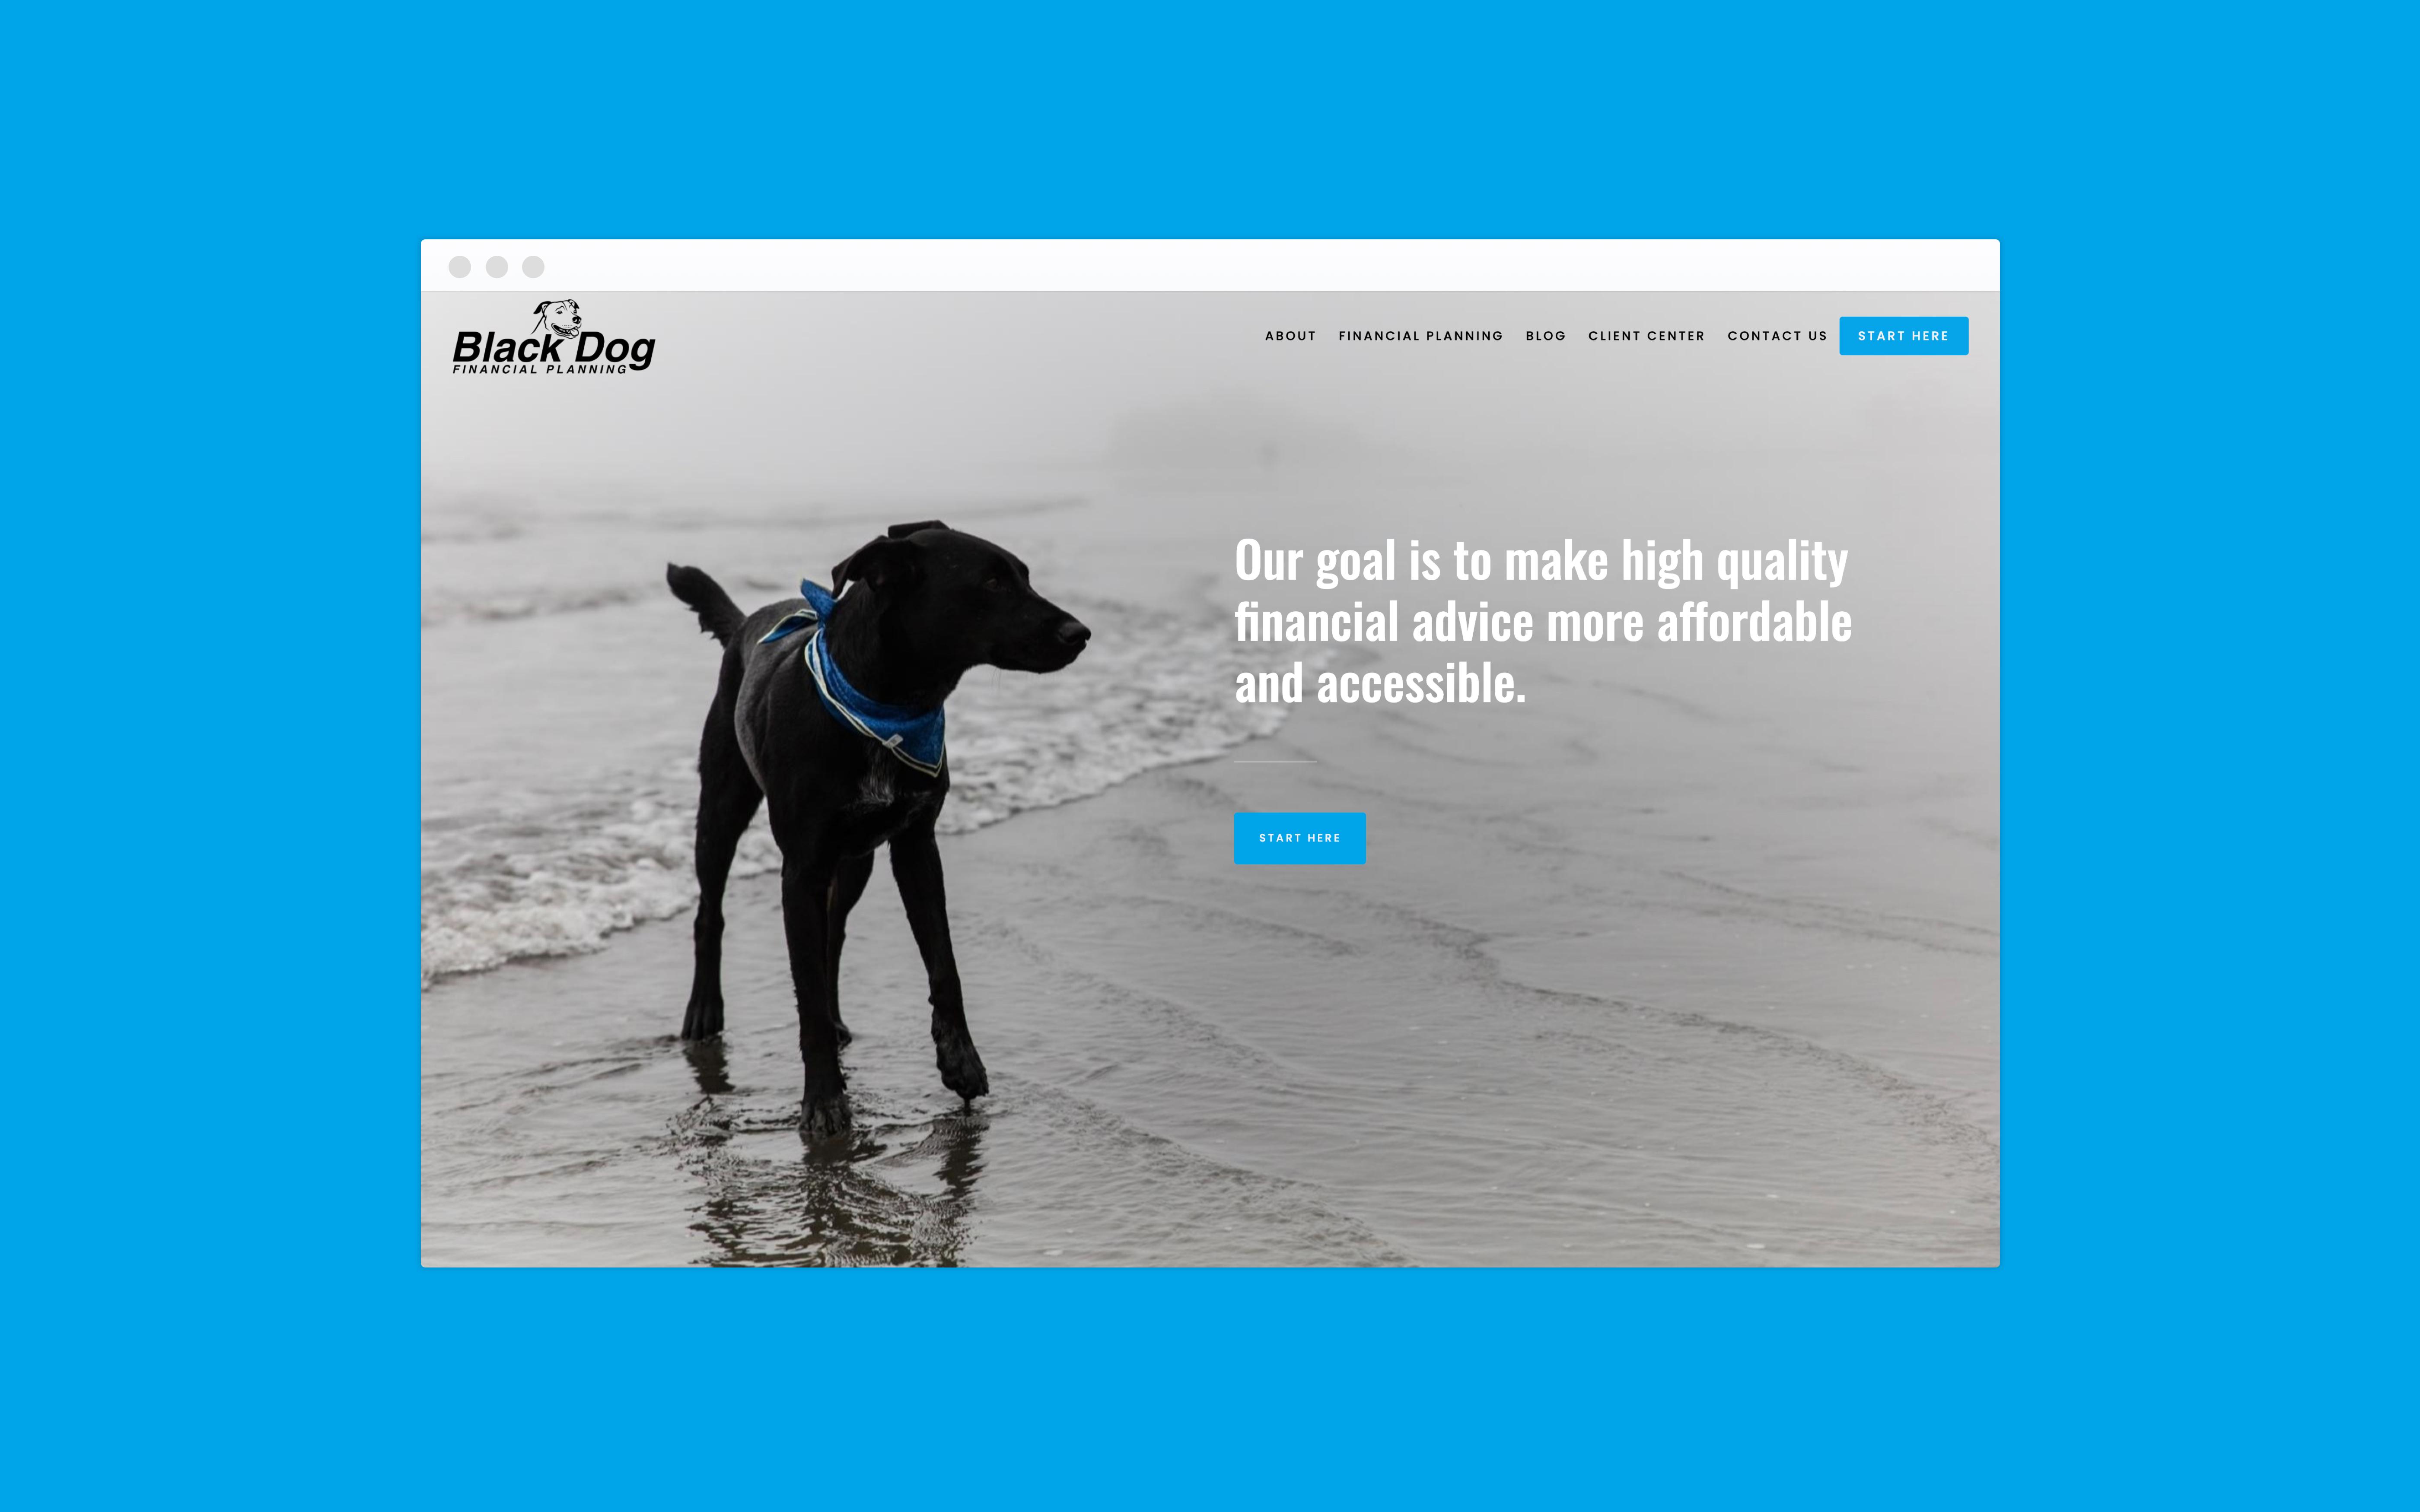 Black Dog Financial Planning